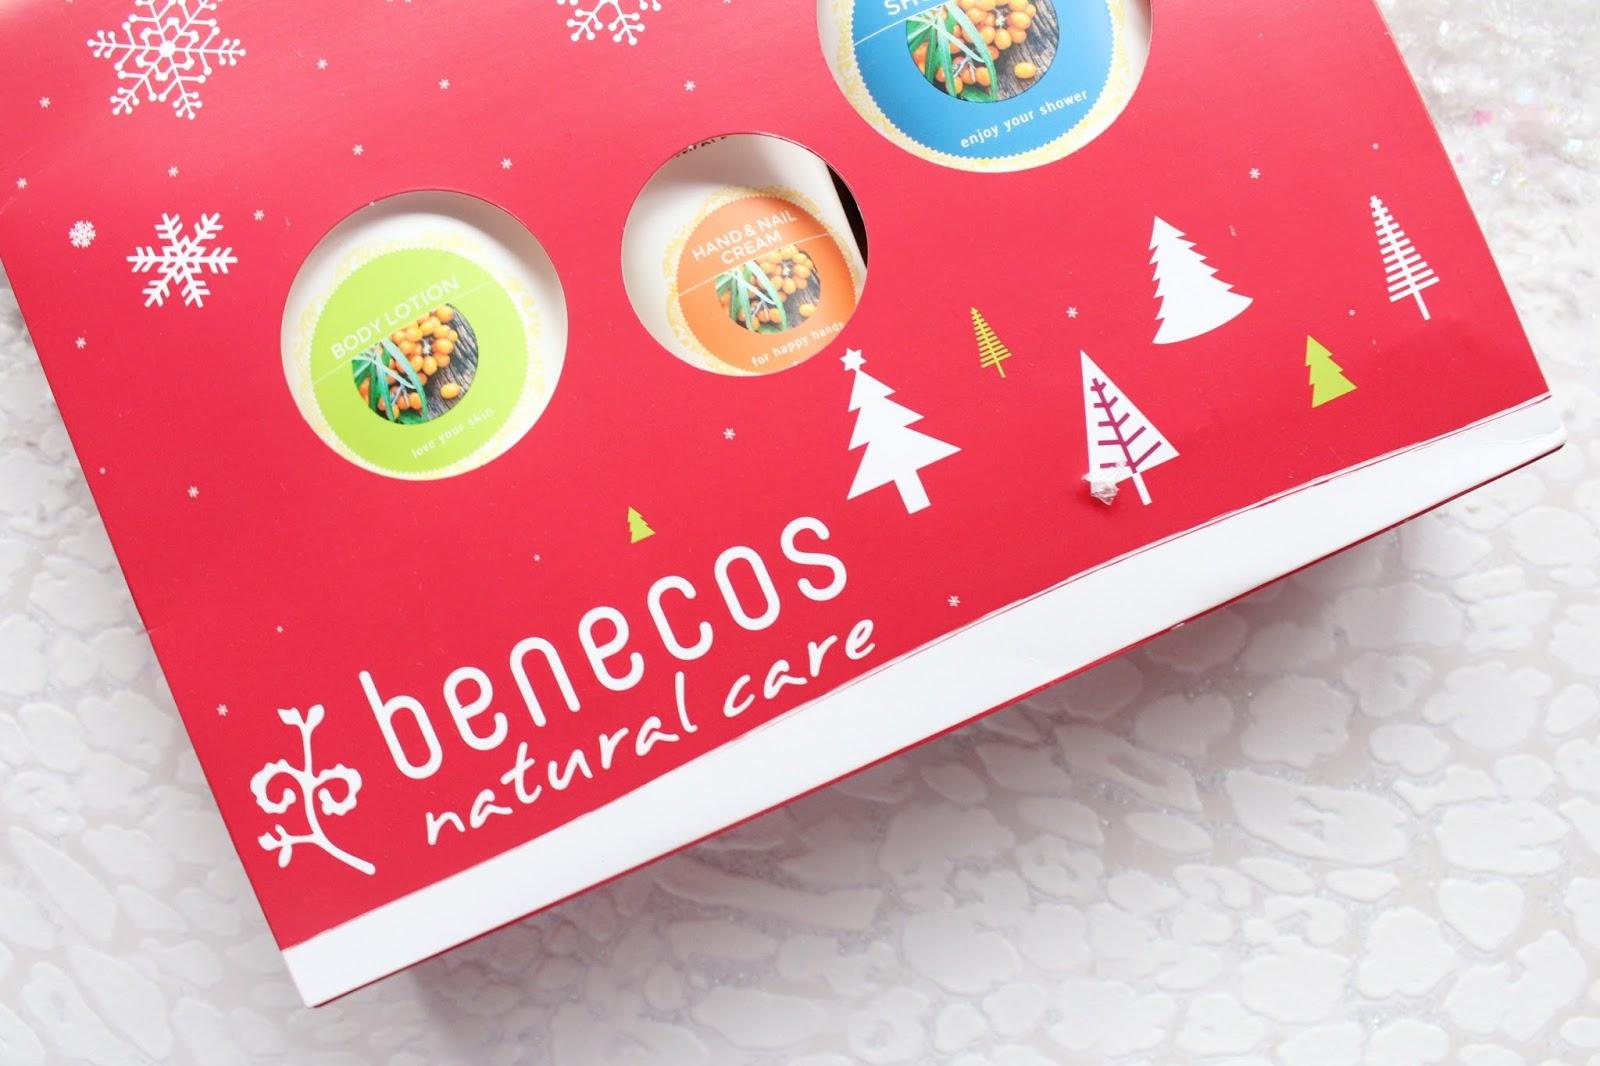 Benecos Orange and Sea Buckthorn Gift Set